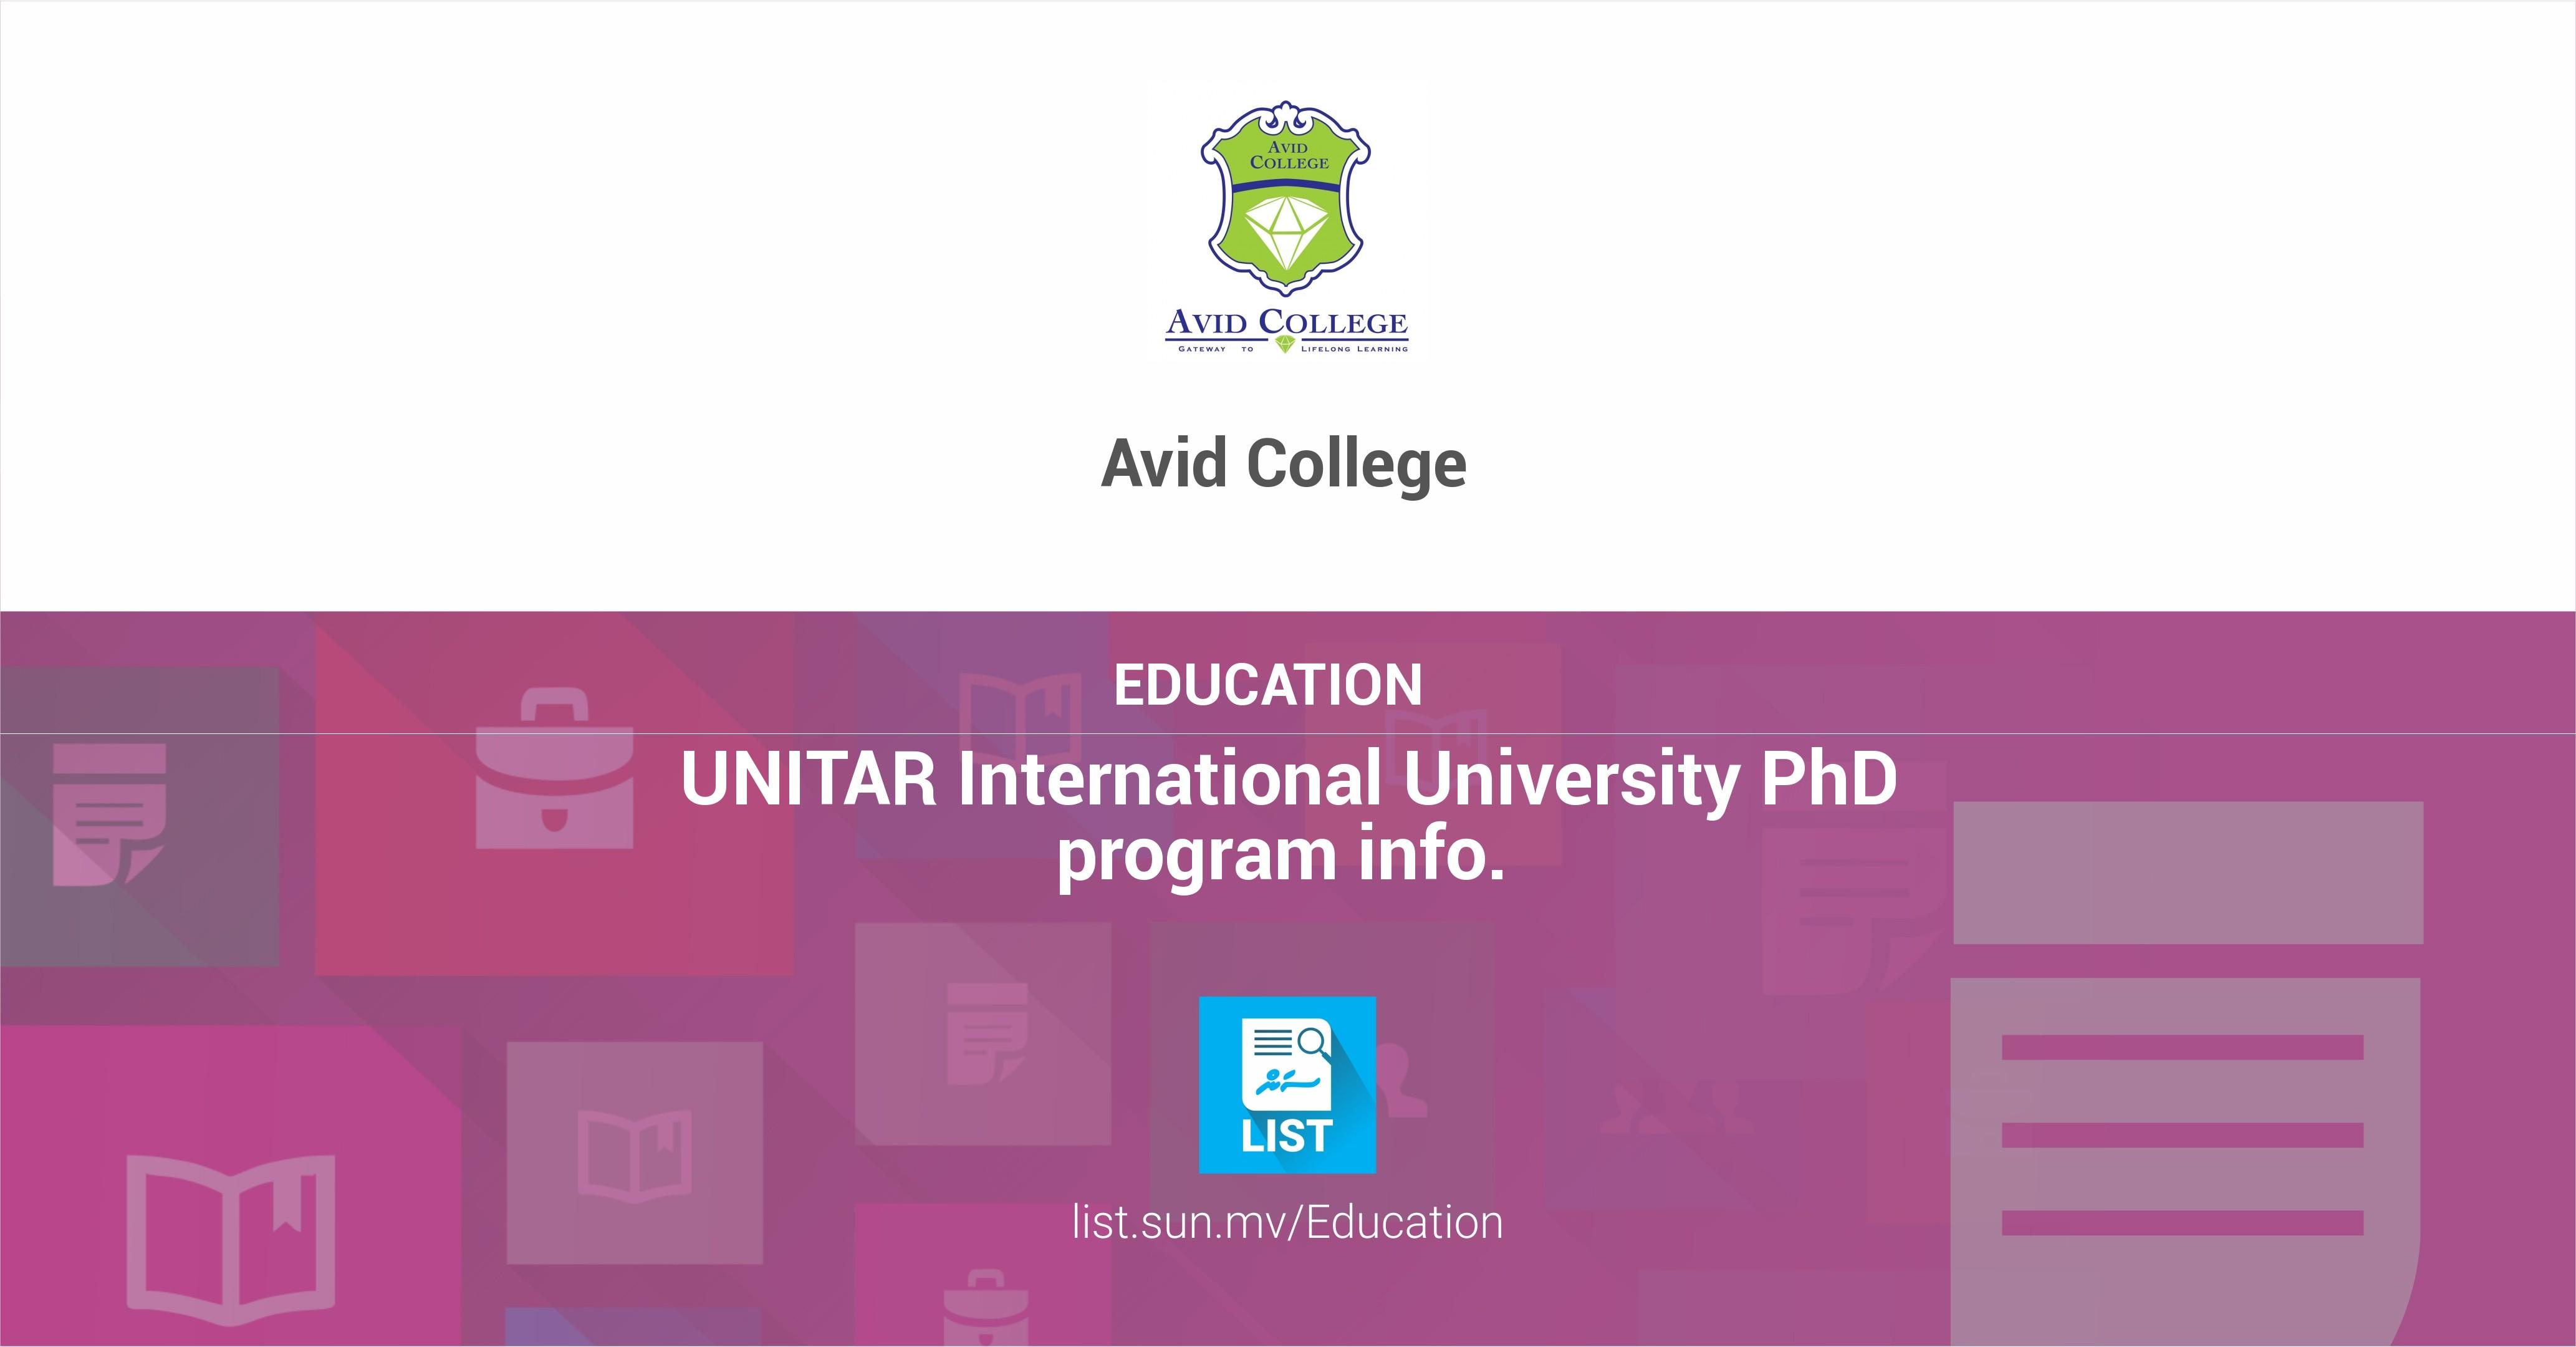 UNITAR International University PhD program info